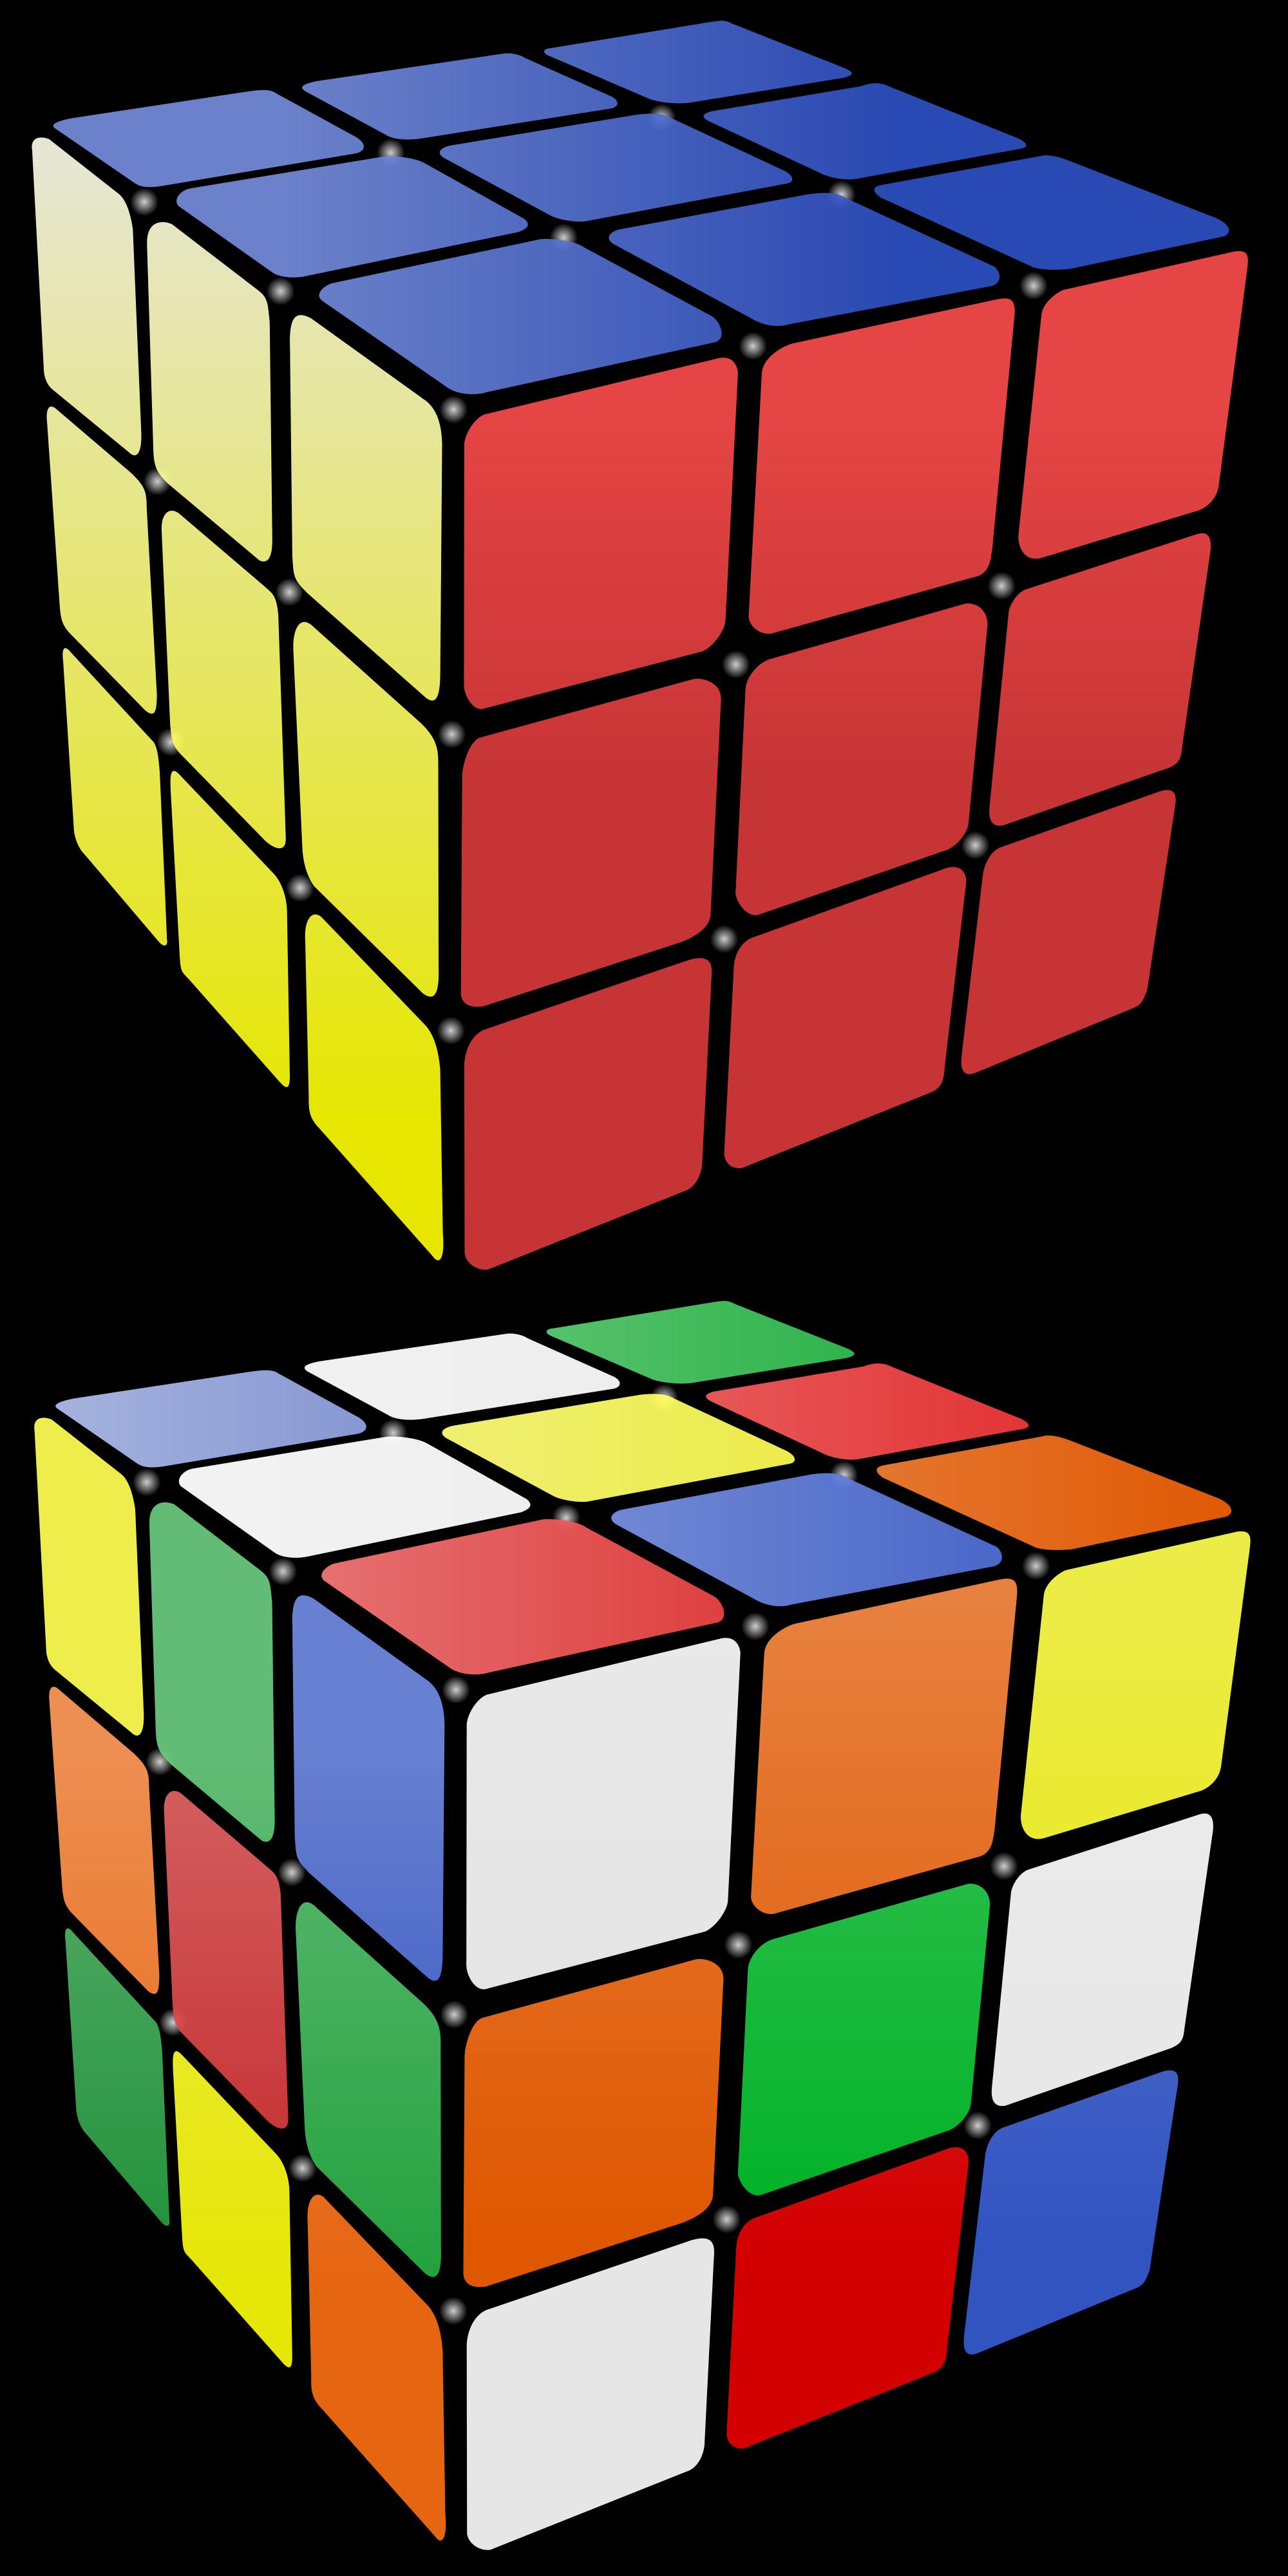 Rubik S Cube Rubiks Cube Rubicks Cube Cube